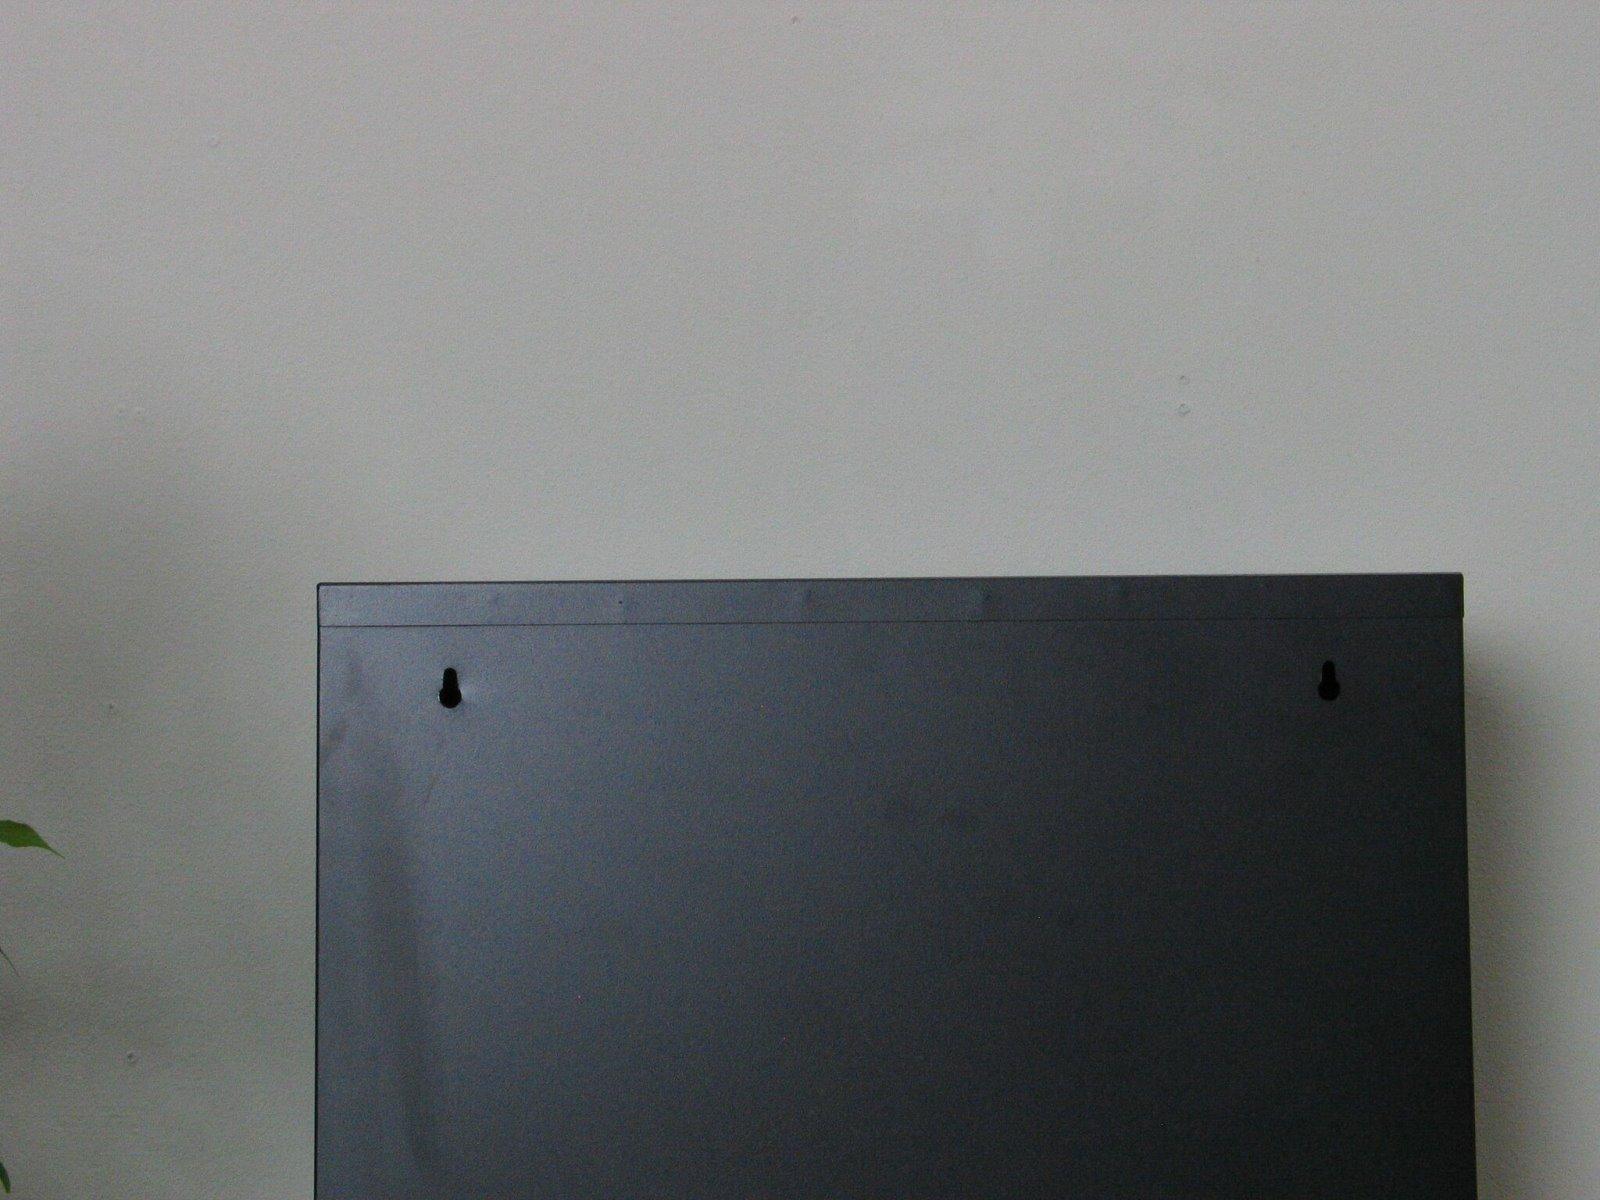 xxl schuhschrank pisa 15 klappen metall schuhkipper. Black Bedroom Furniture Sets. Home Design Ideas